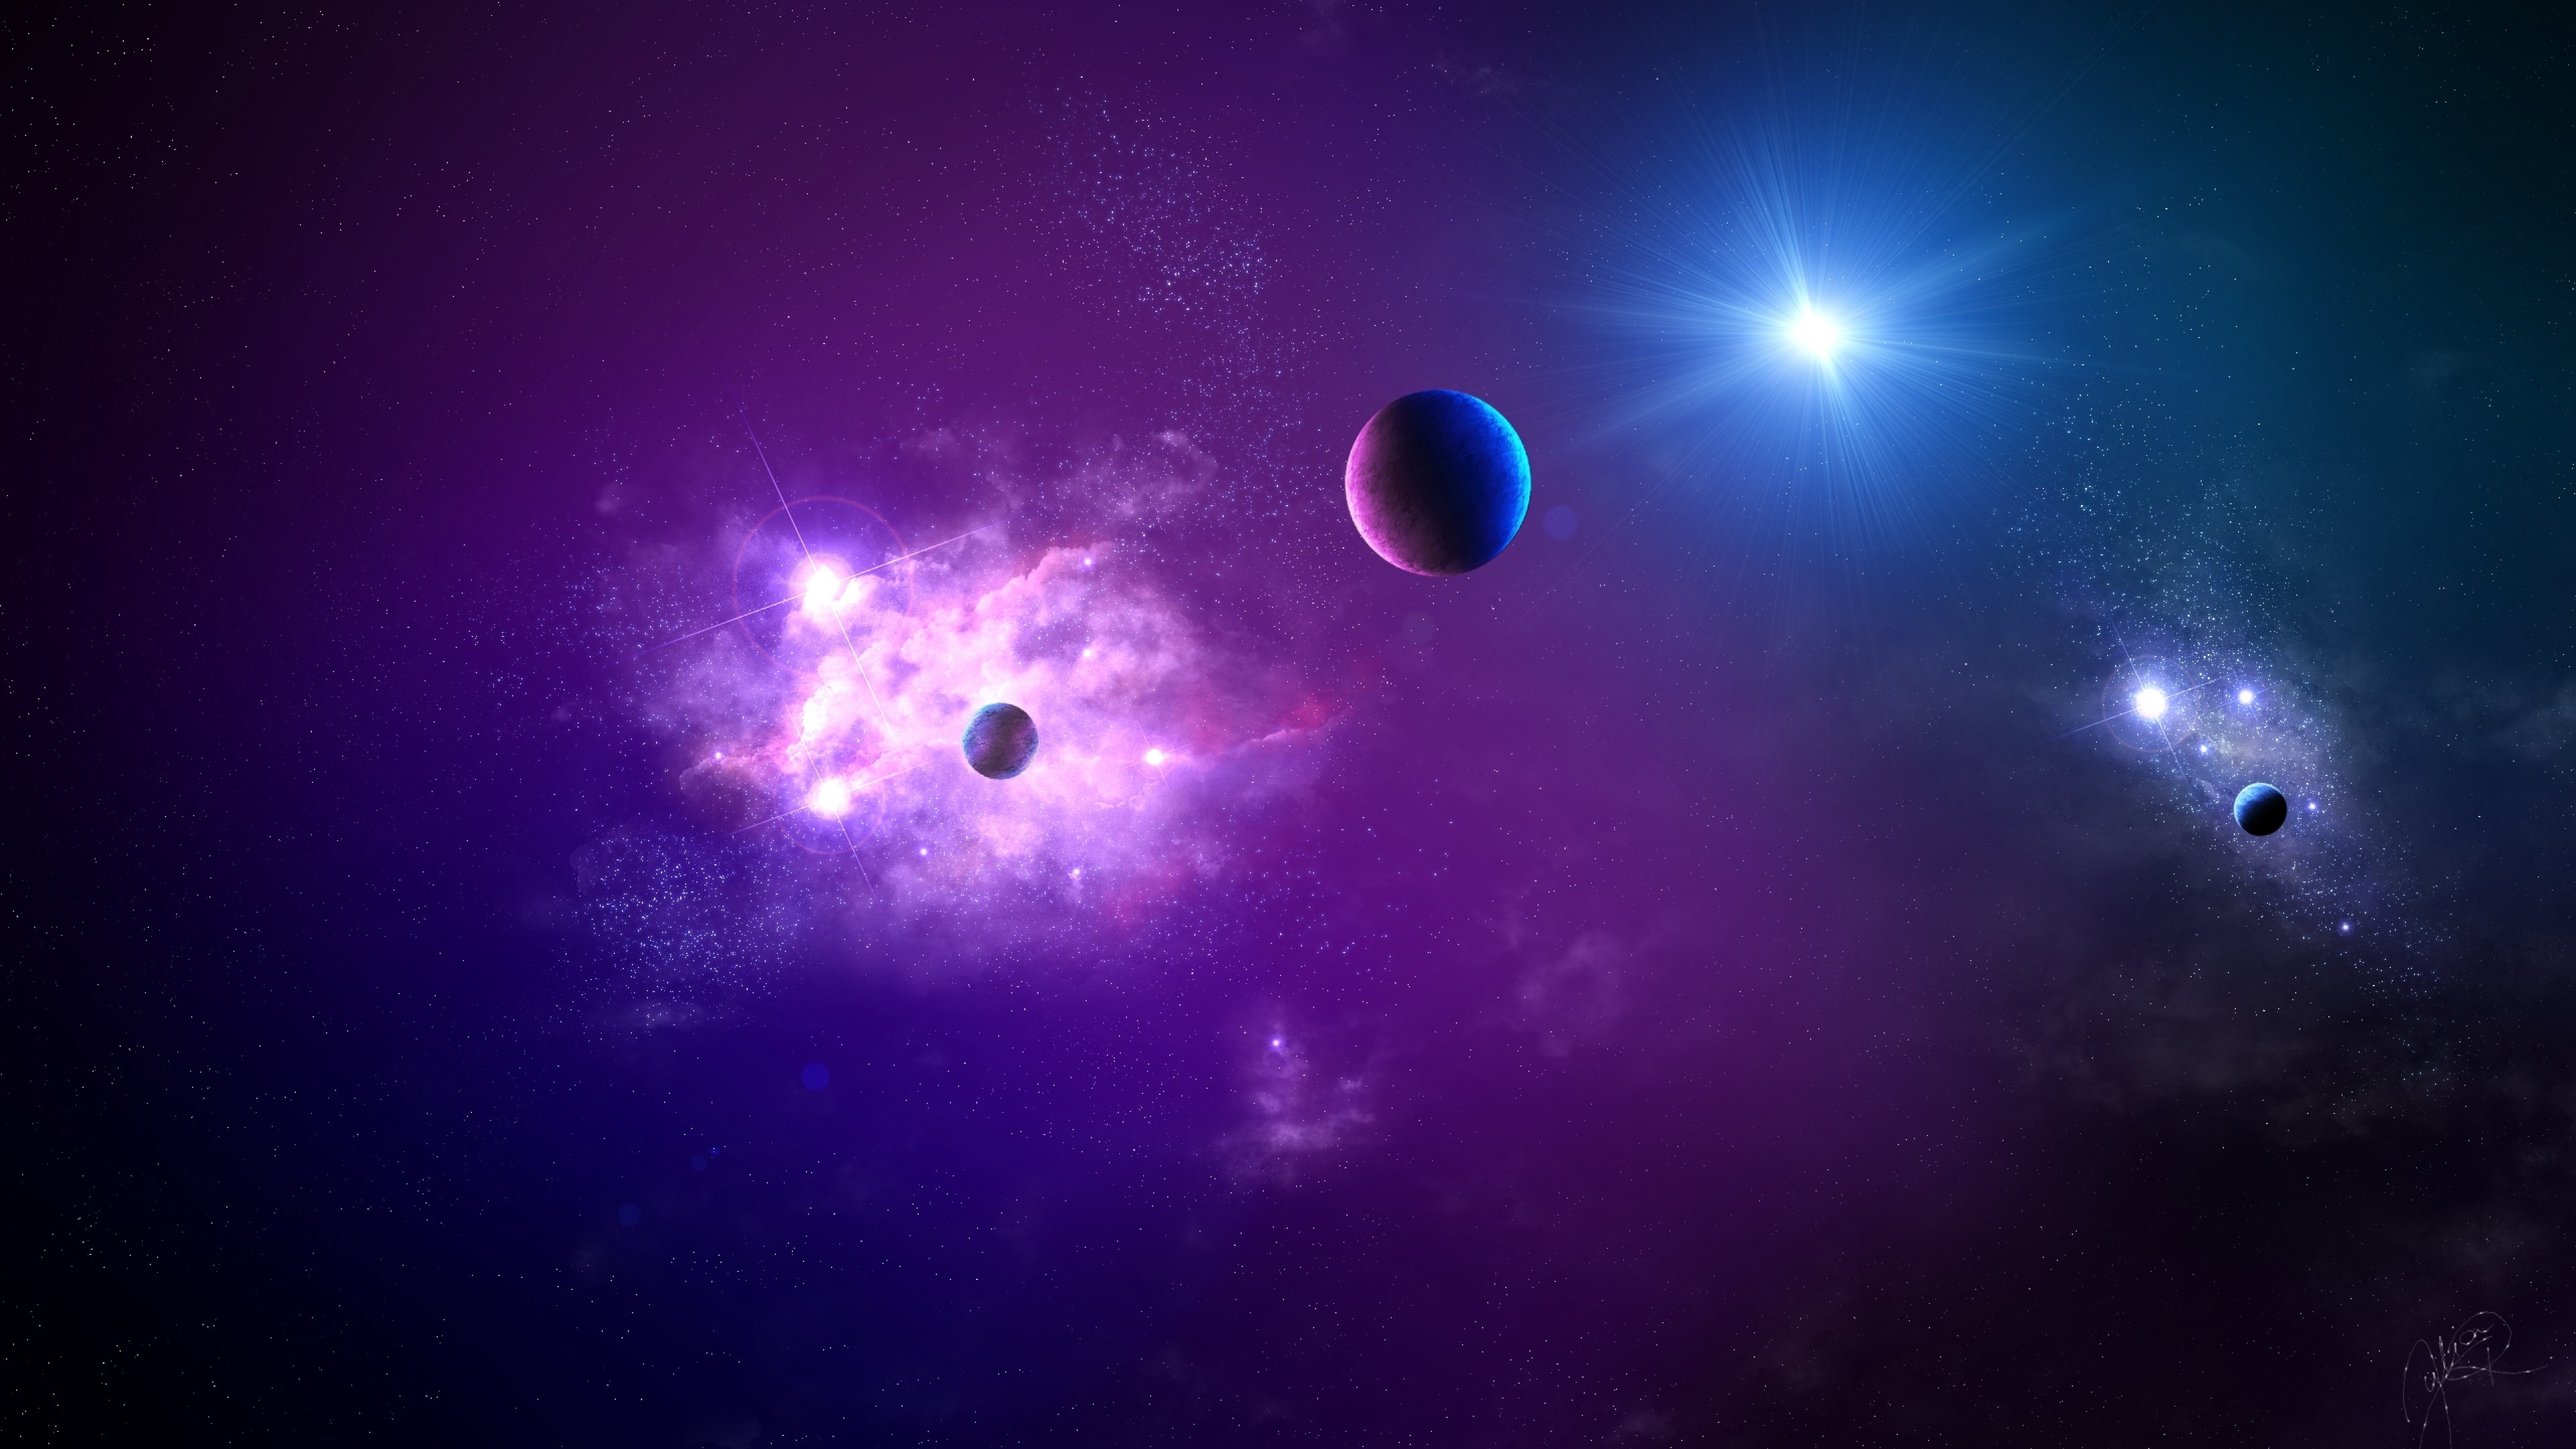 Wallpaper space, planet, light, galaxy